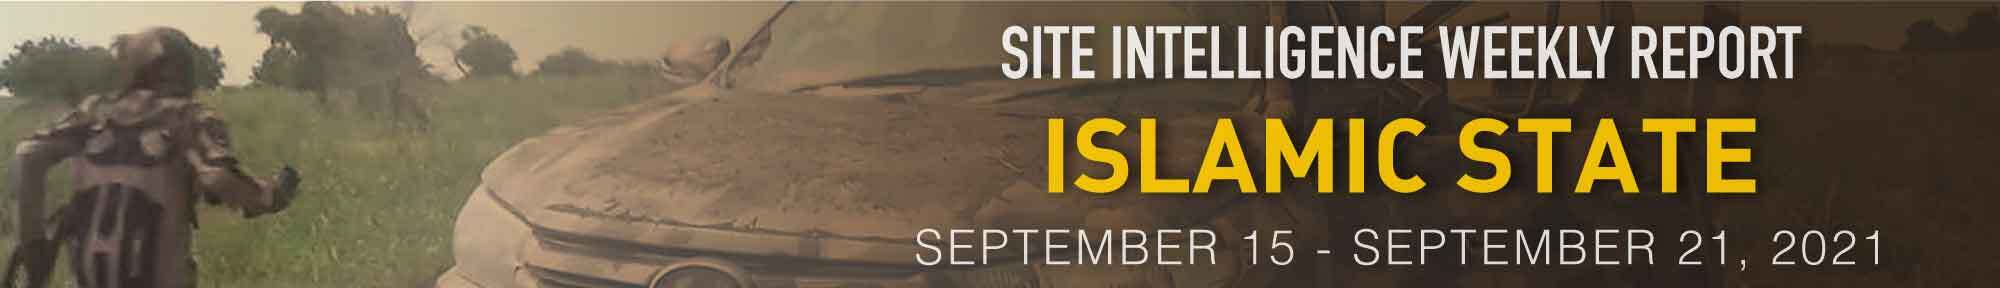 https://ent.siteintelgroup.com/images/masthead/IS_inSITE_Banner_09_15-21_21.jpg